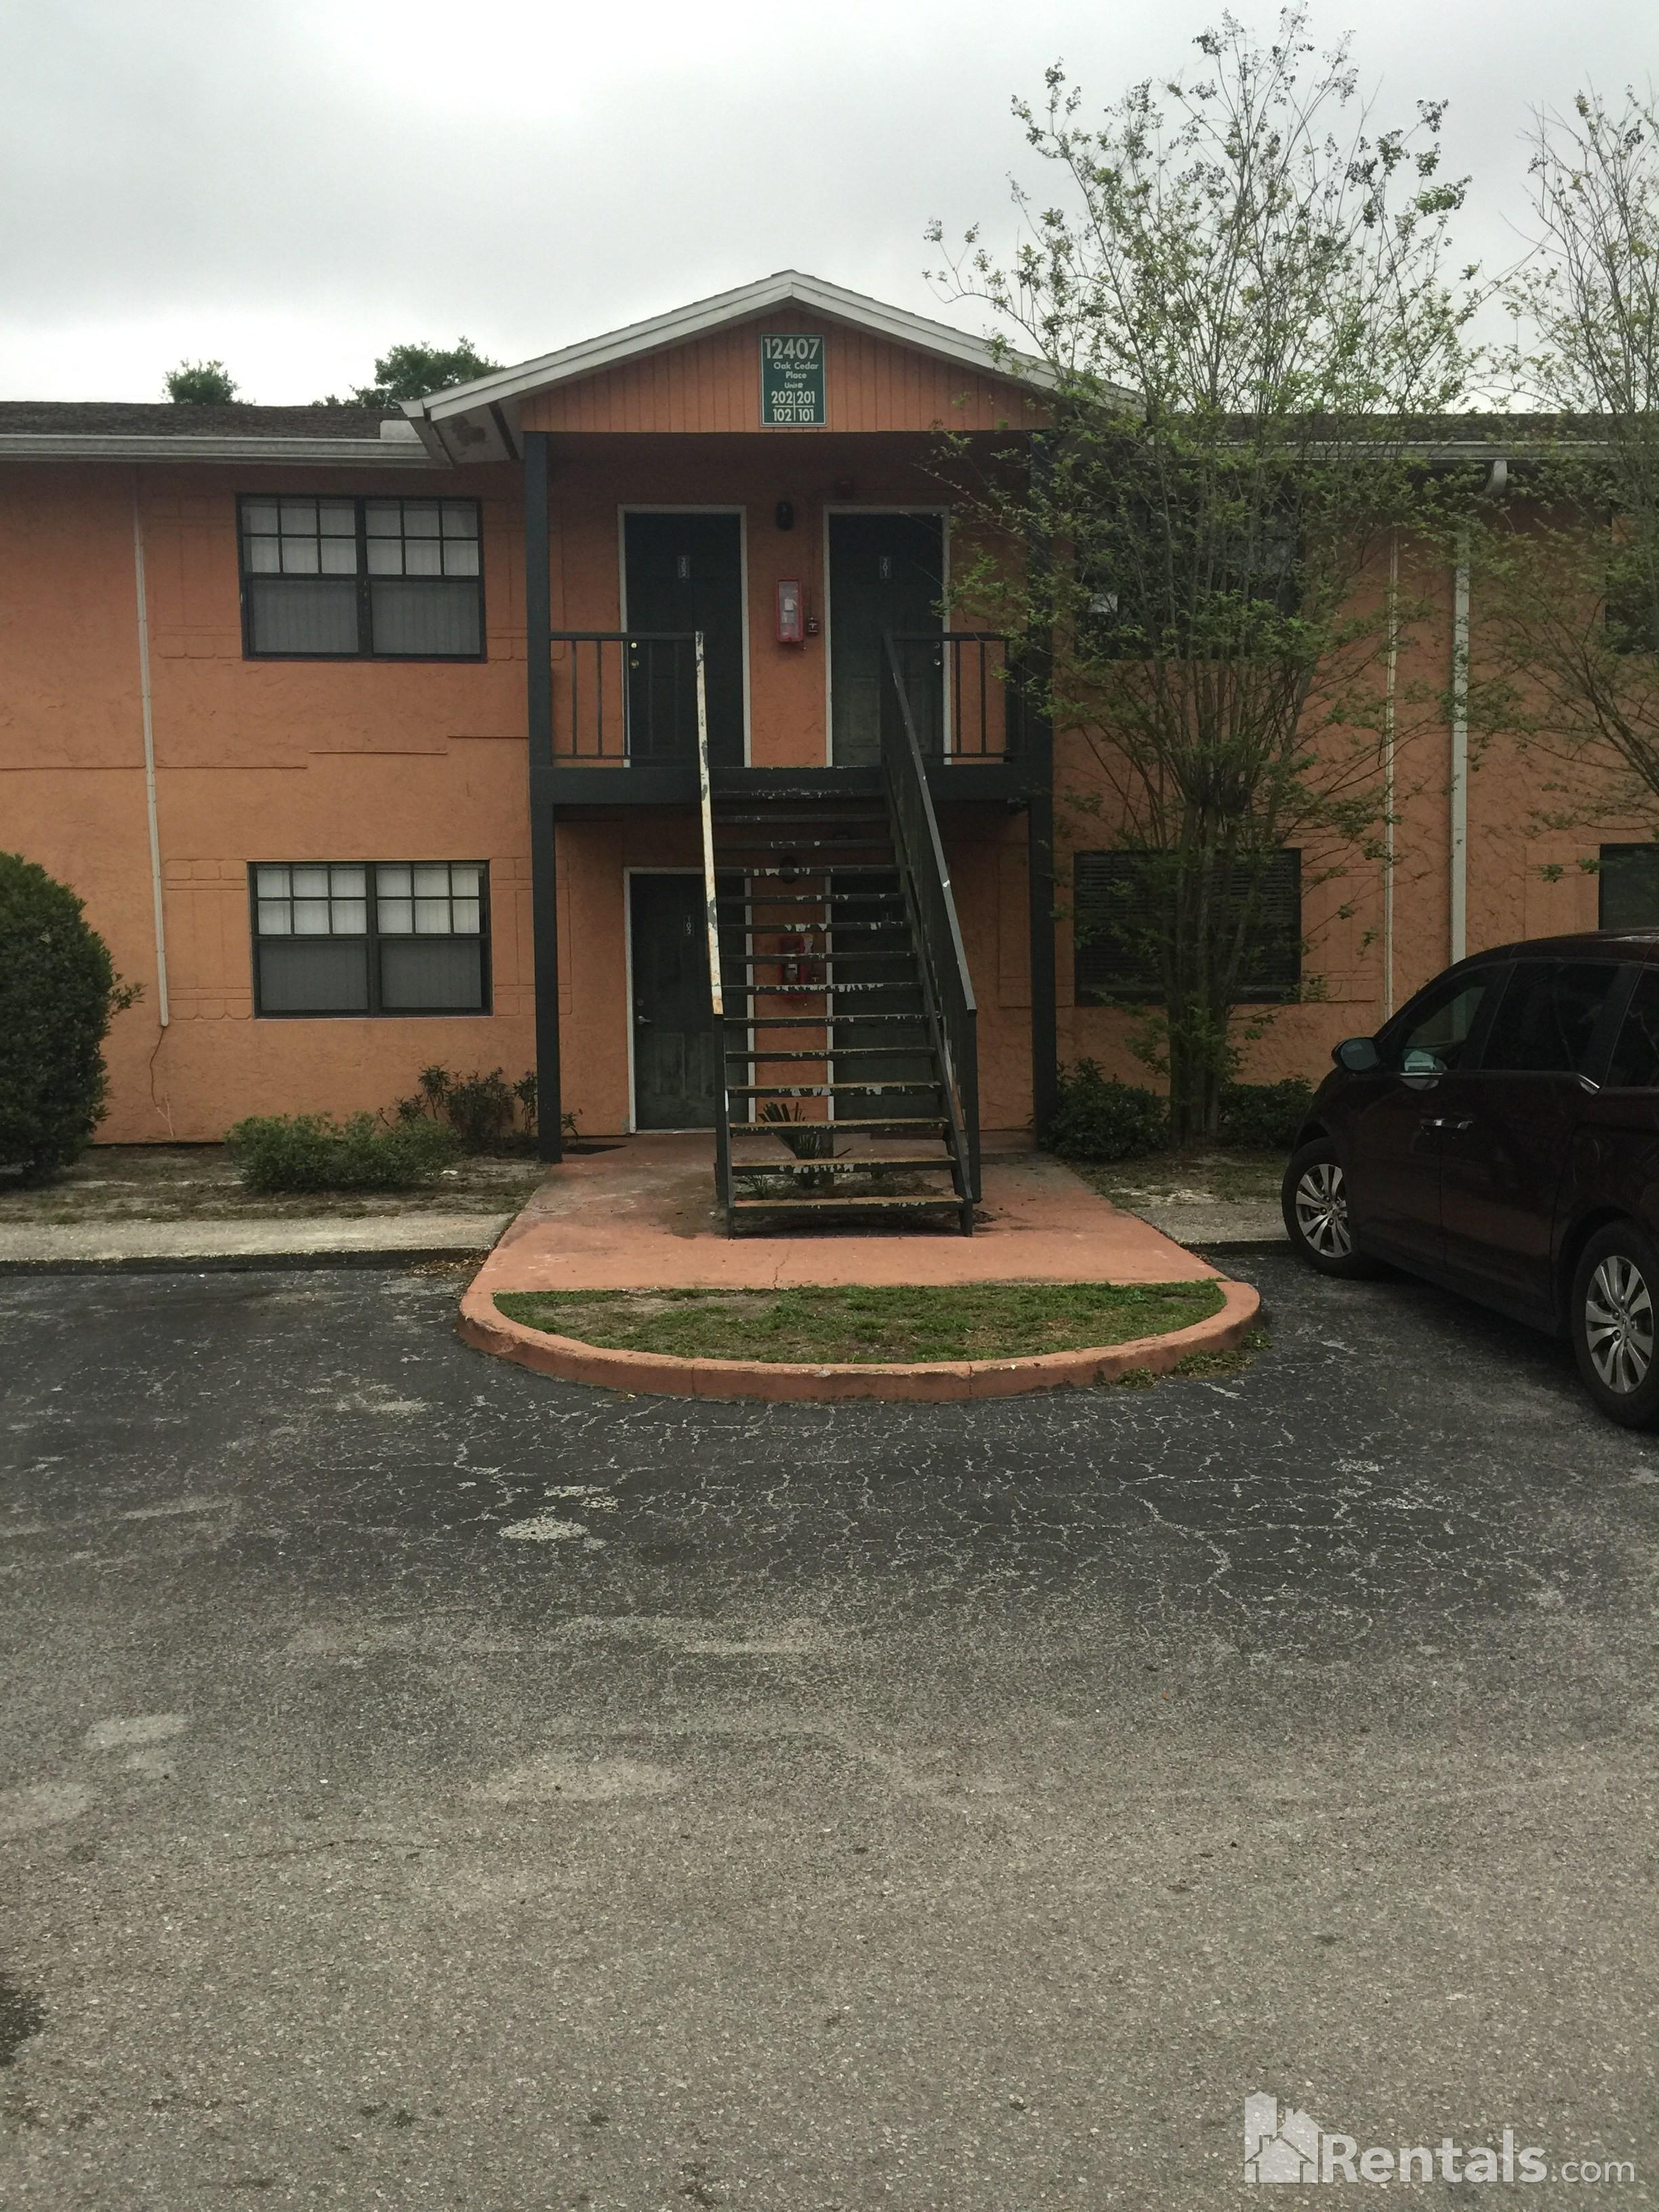 12407 oak cedar pl tampa fl 33612 2 bedroom apartment for rent for